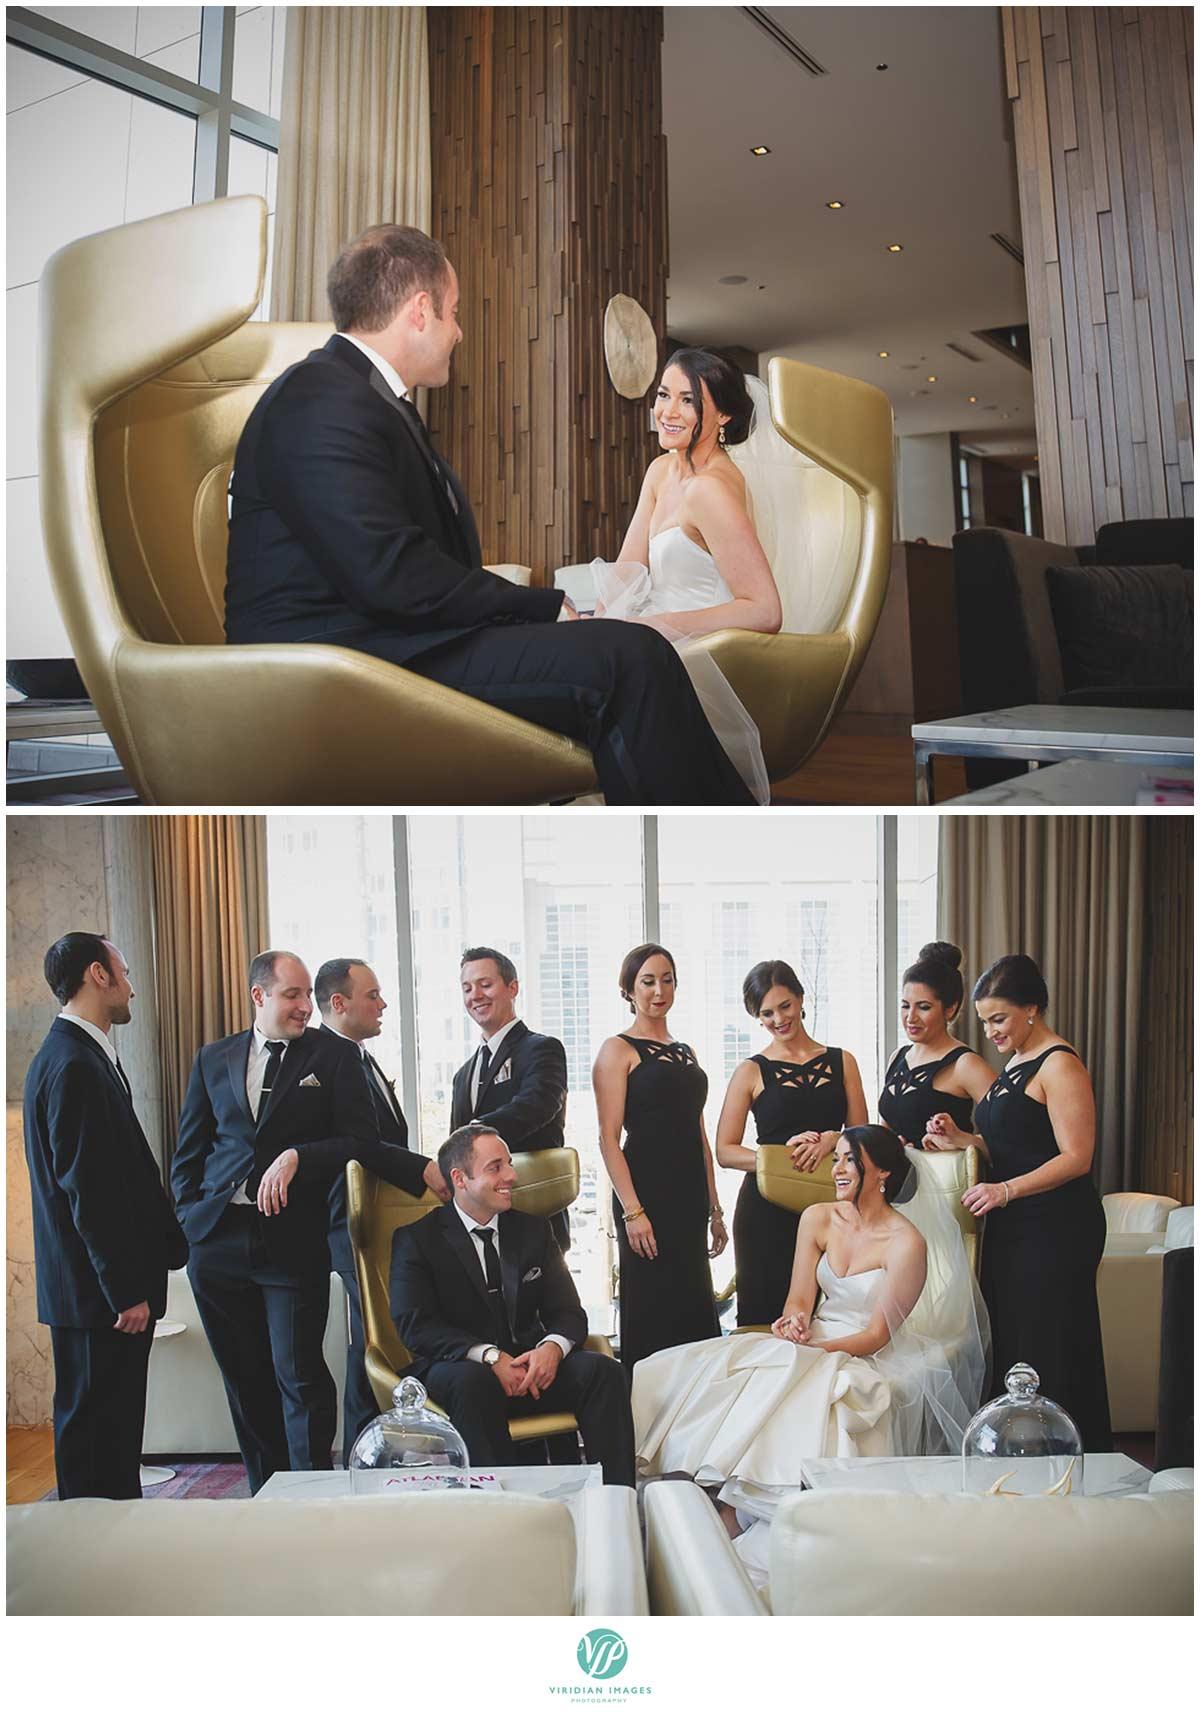 Peachtree_Club_Atlanta_Wedding_Viridian_Images_Photography-19